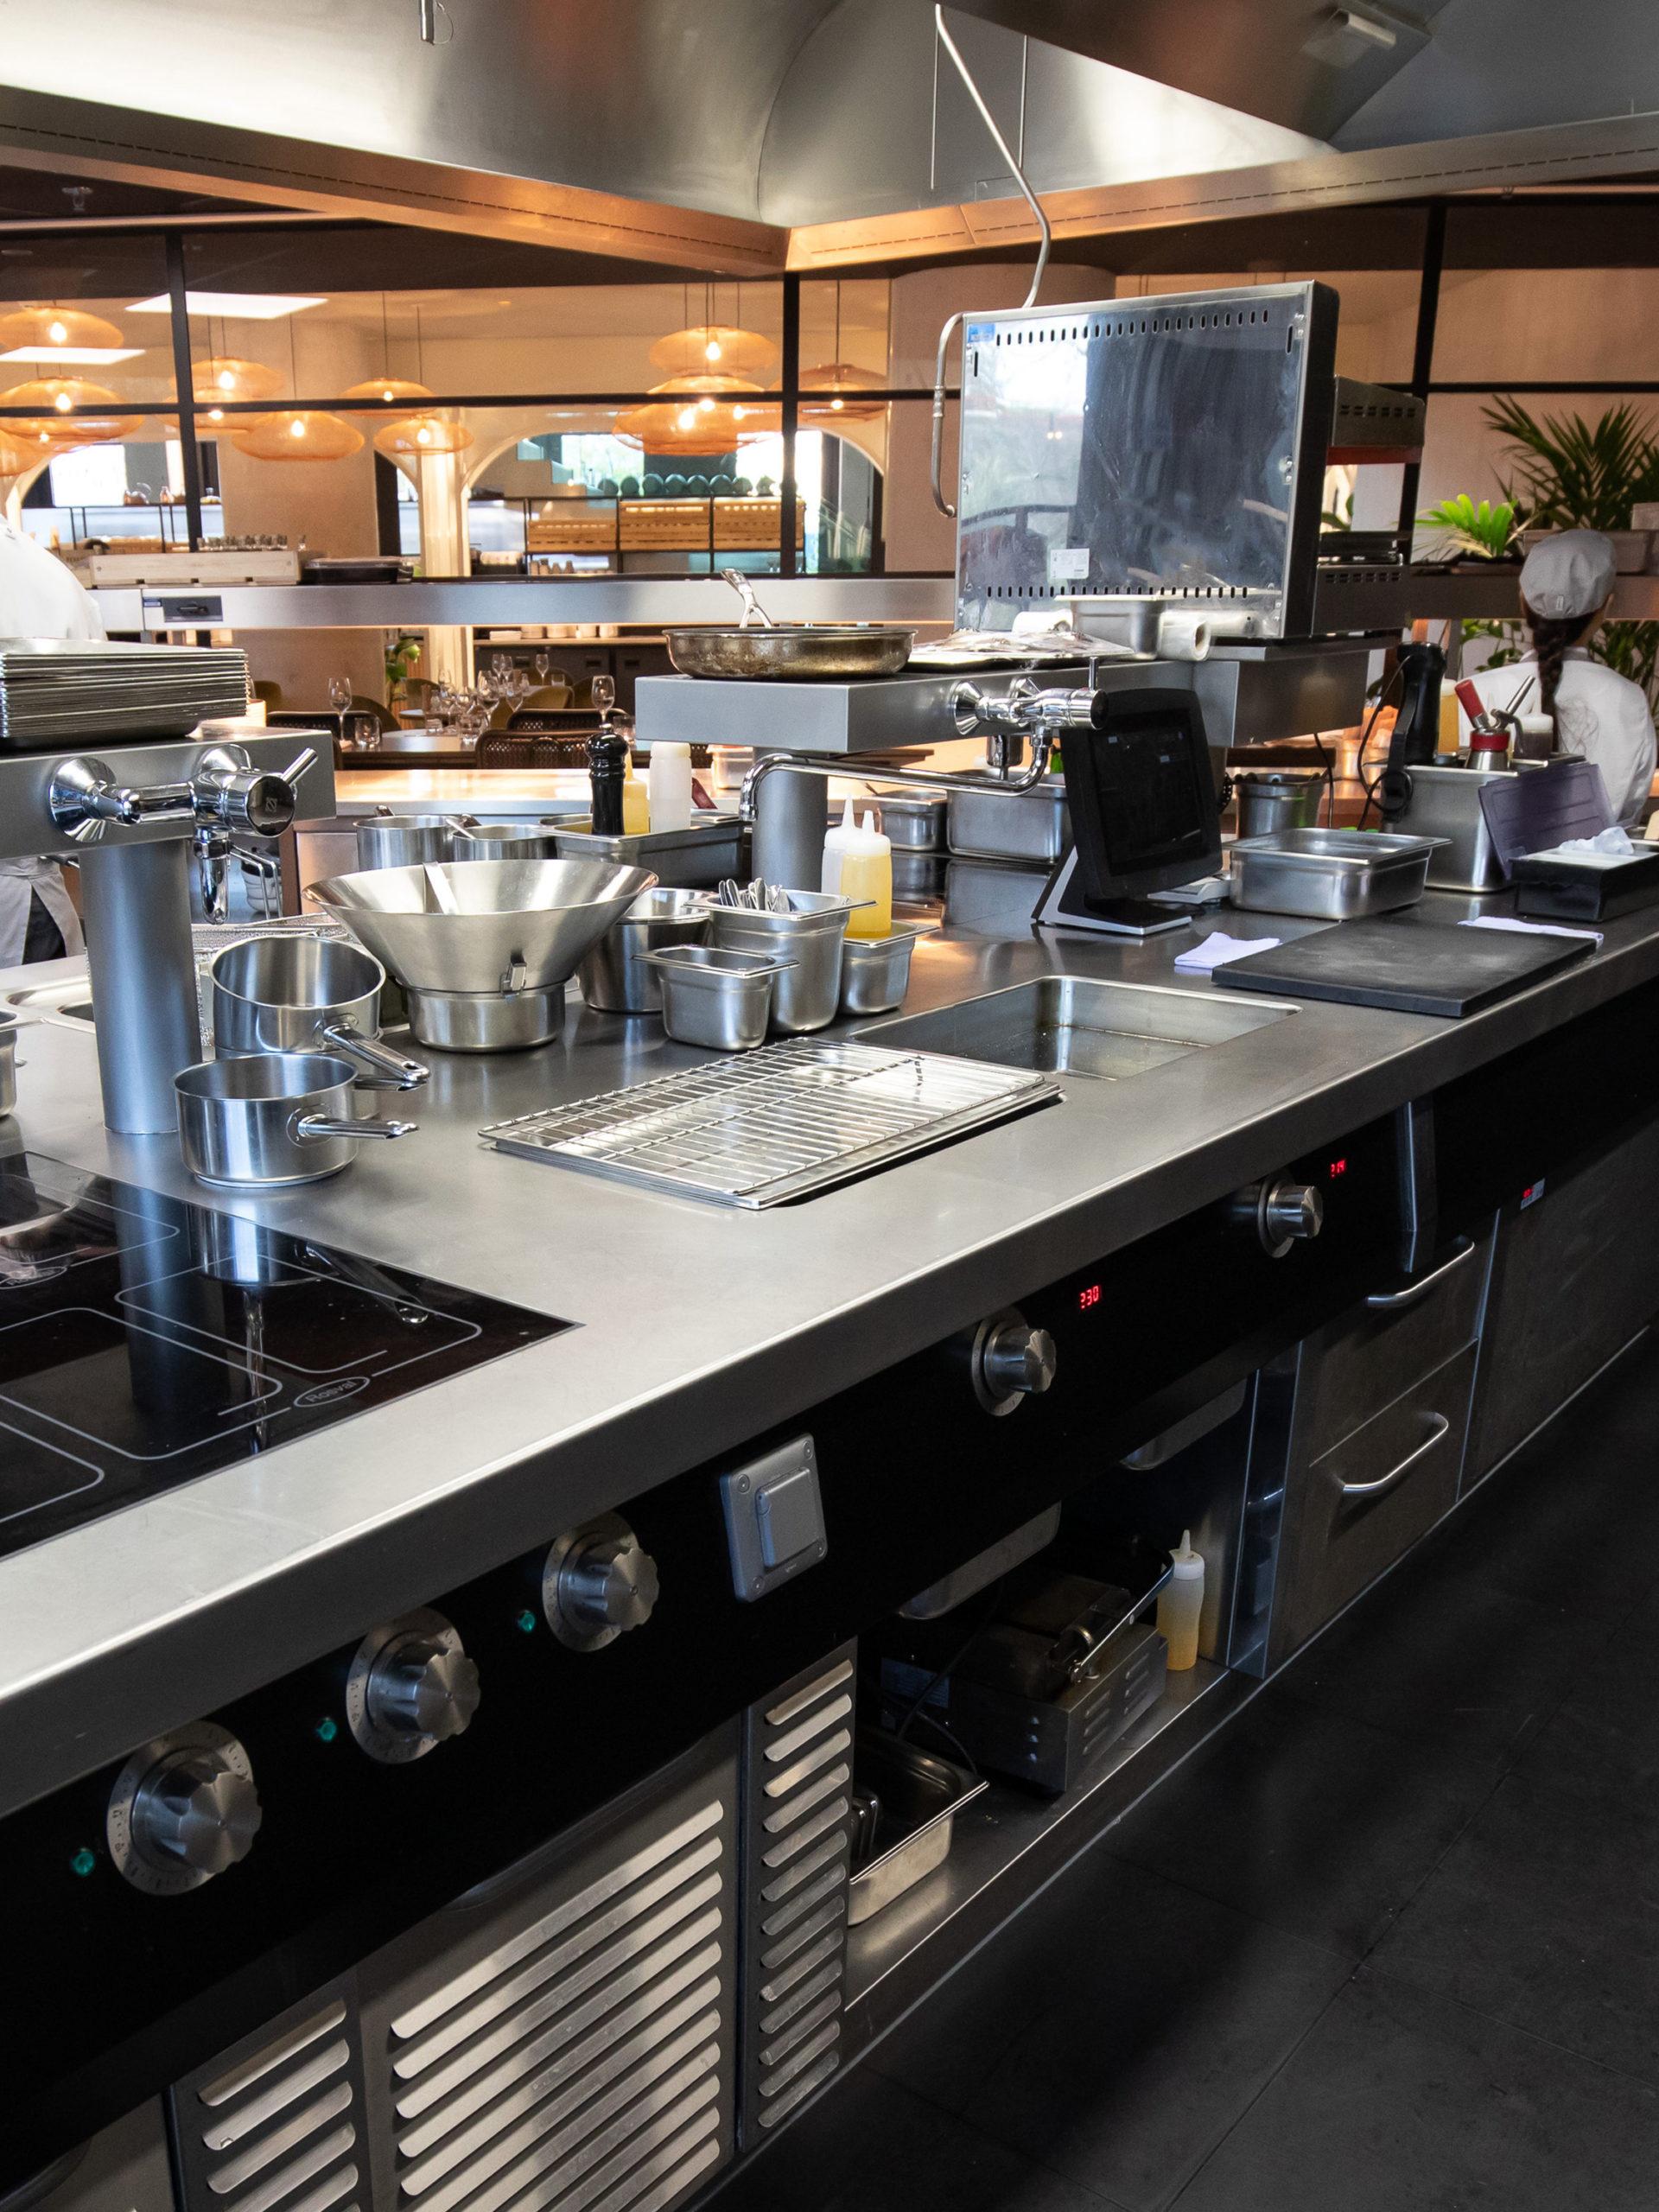 Keukenvandanny zakelijk; Keuken